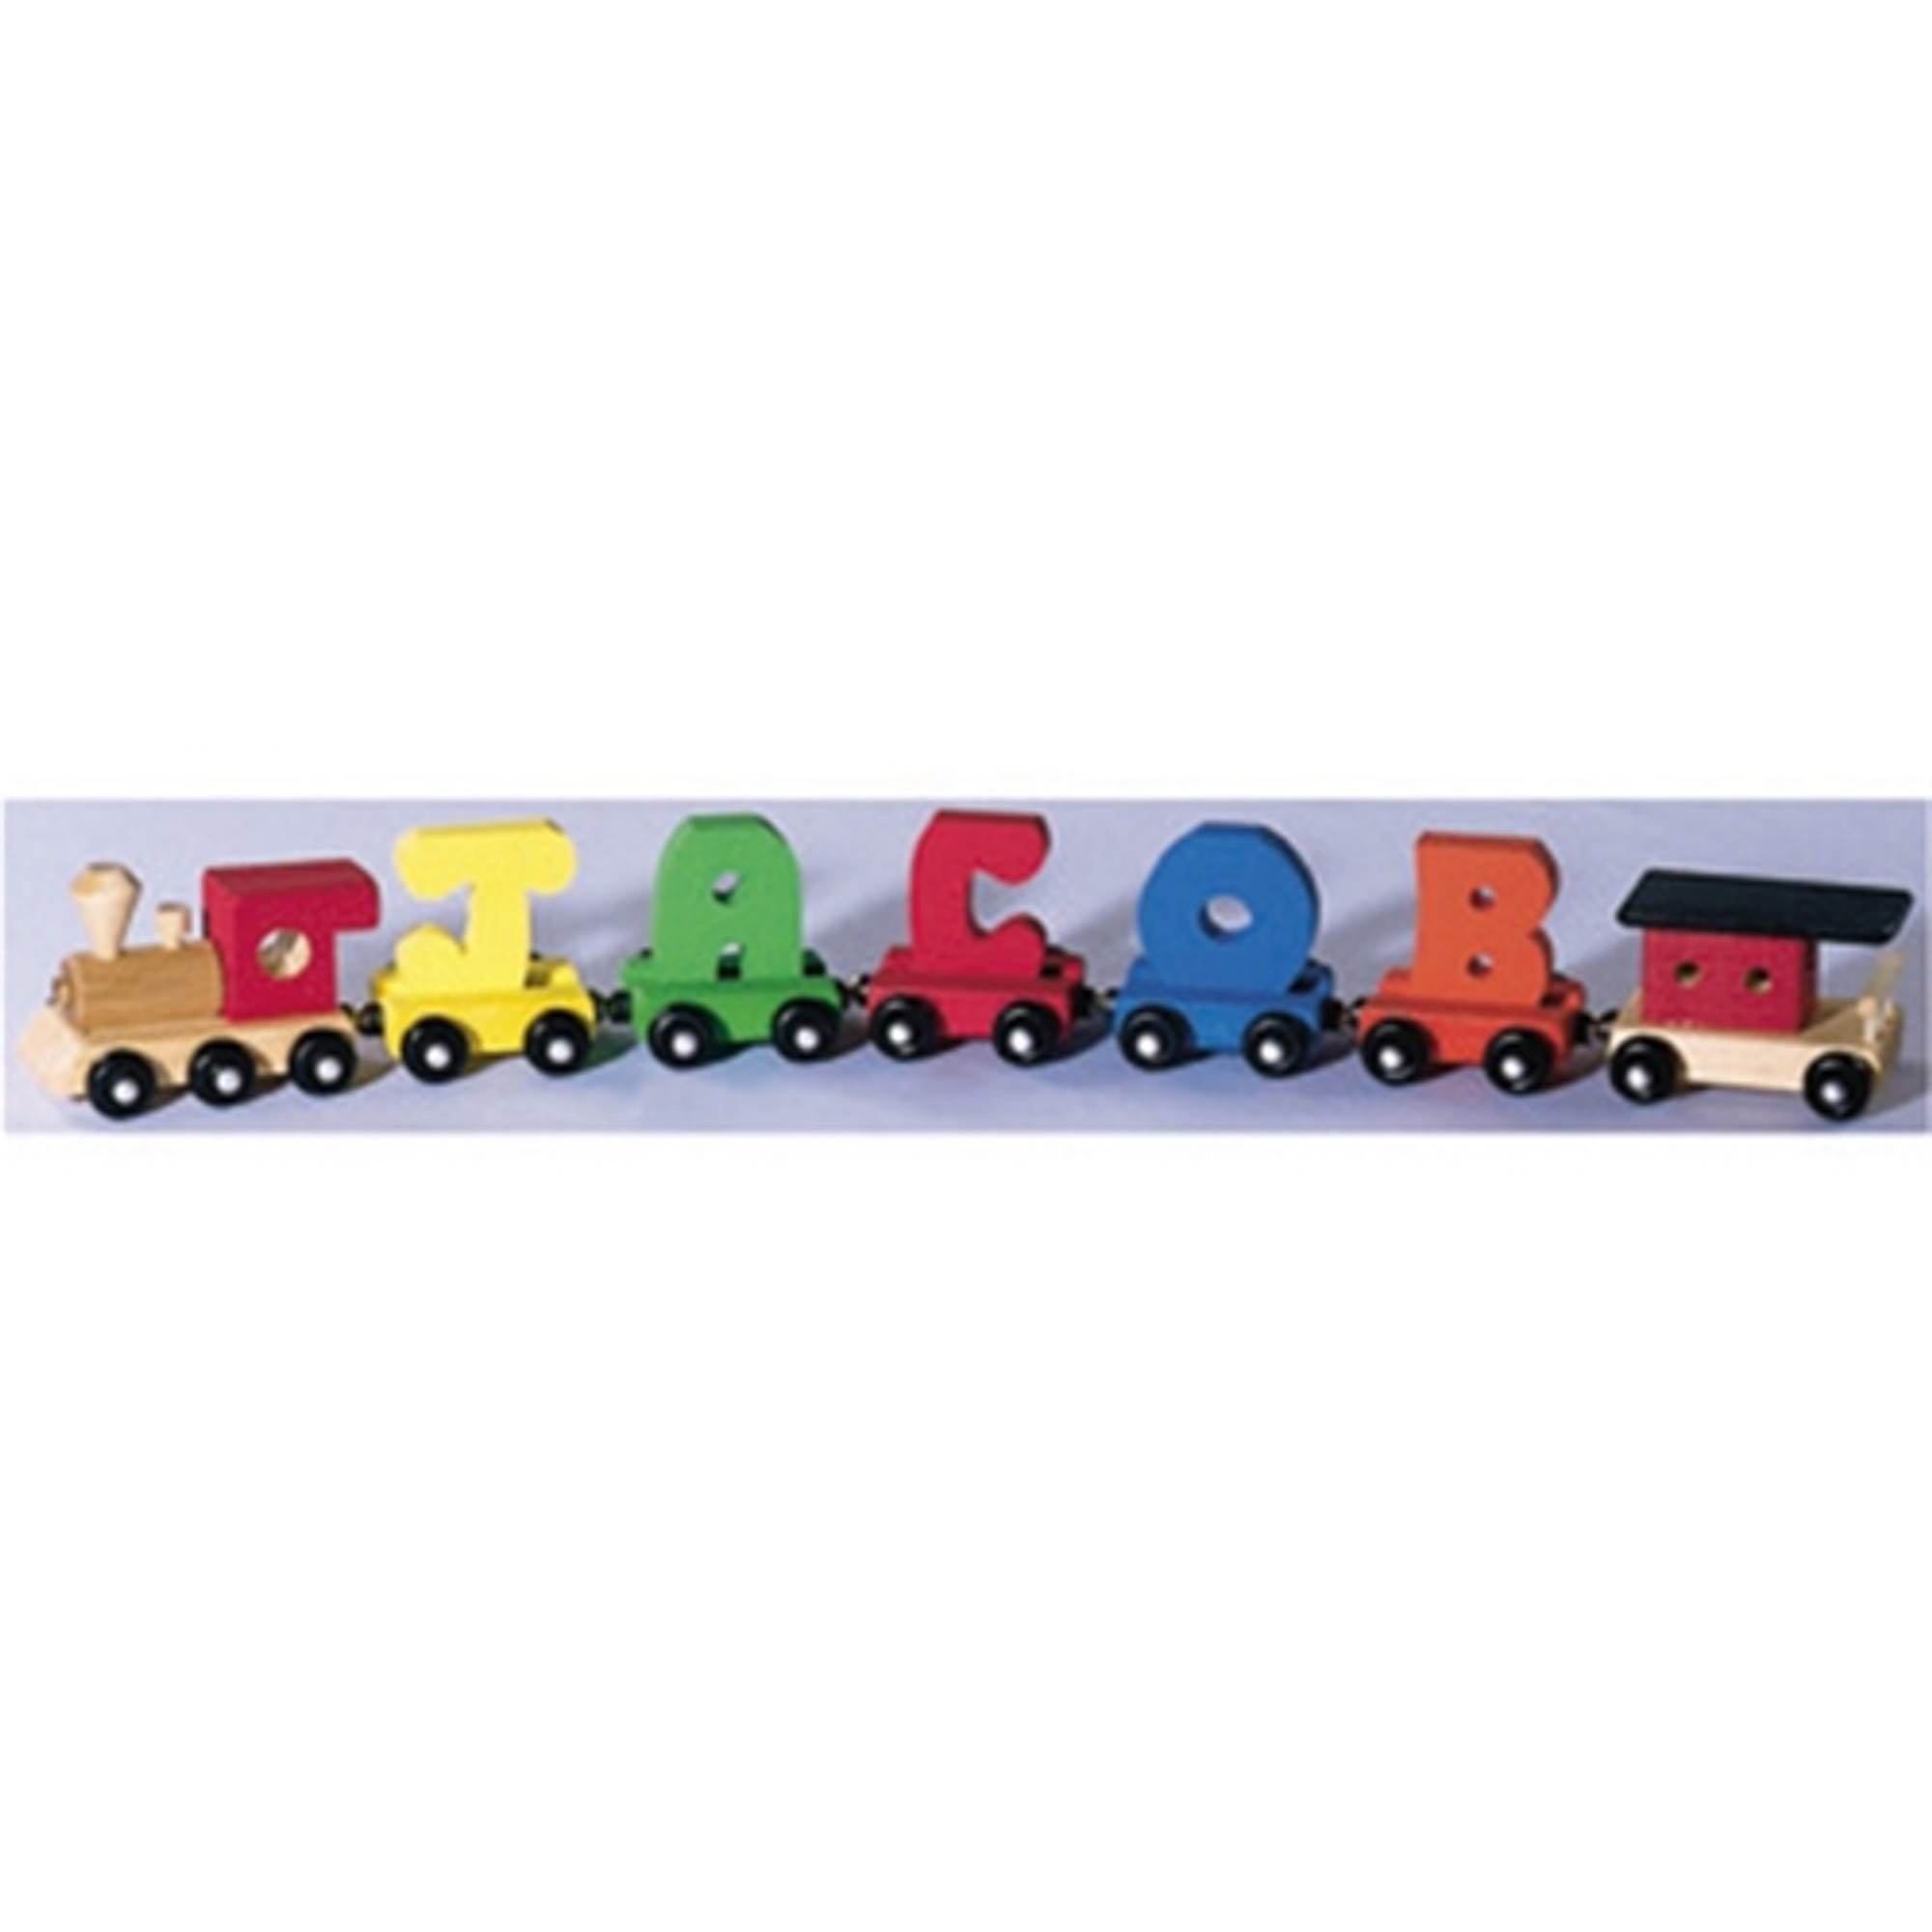 Train Parts Names : Name train parts kit cherry tree toys